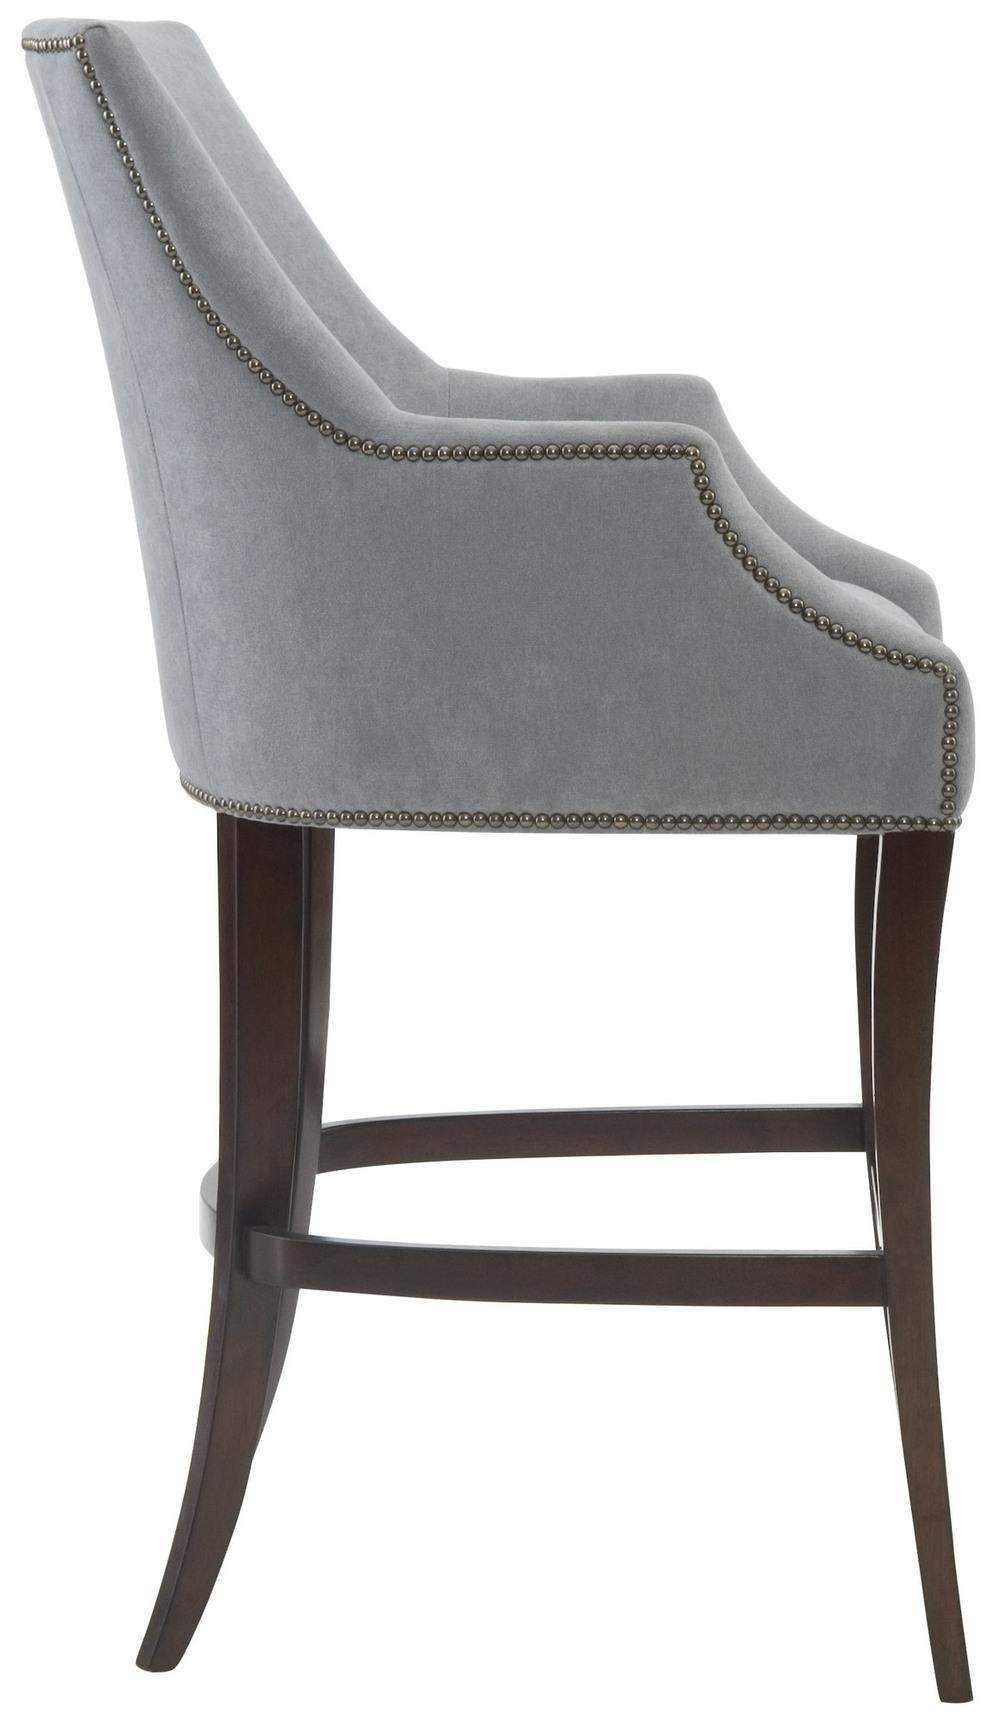 Bernhardt - Chairside Table